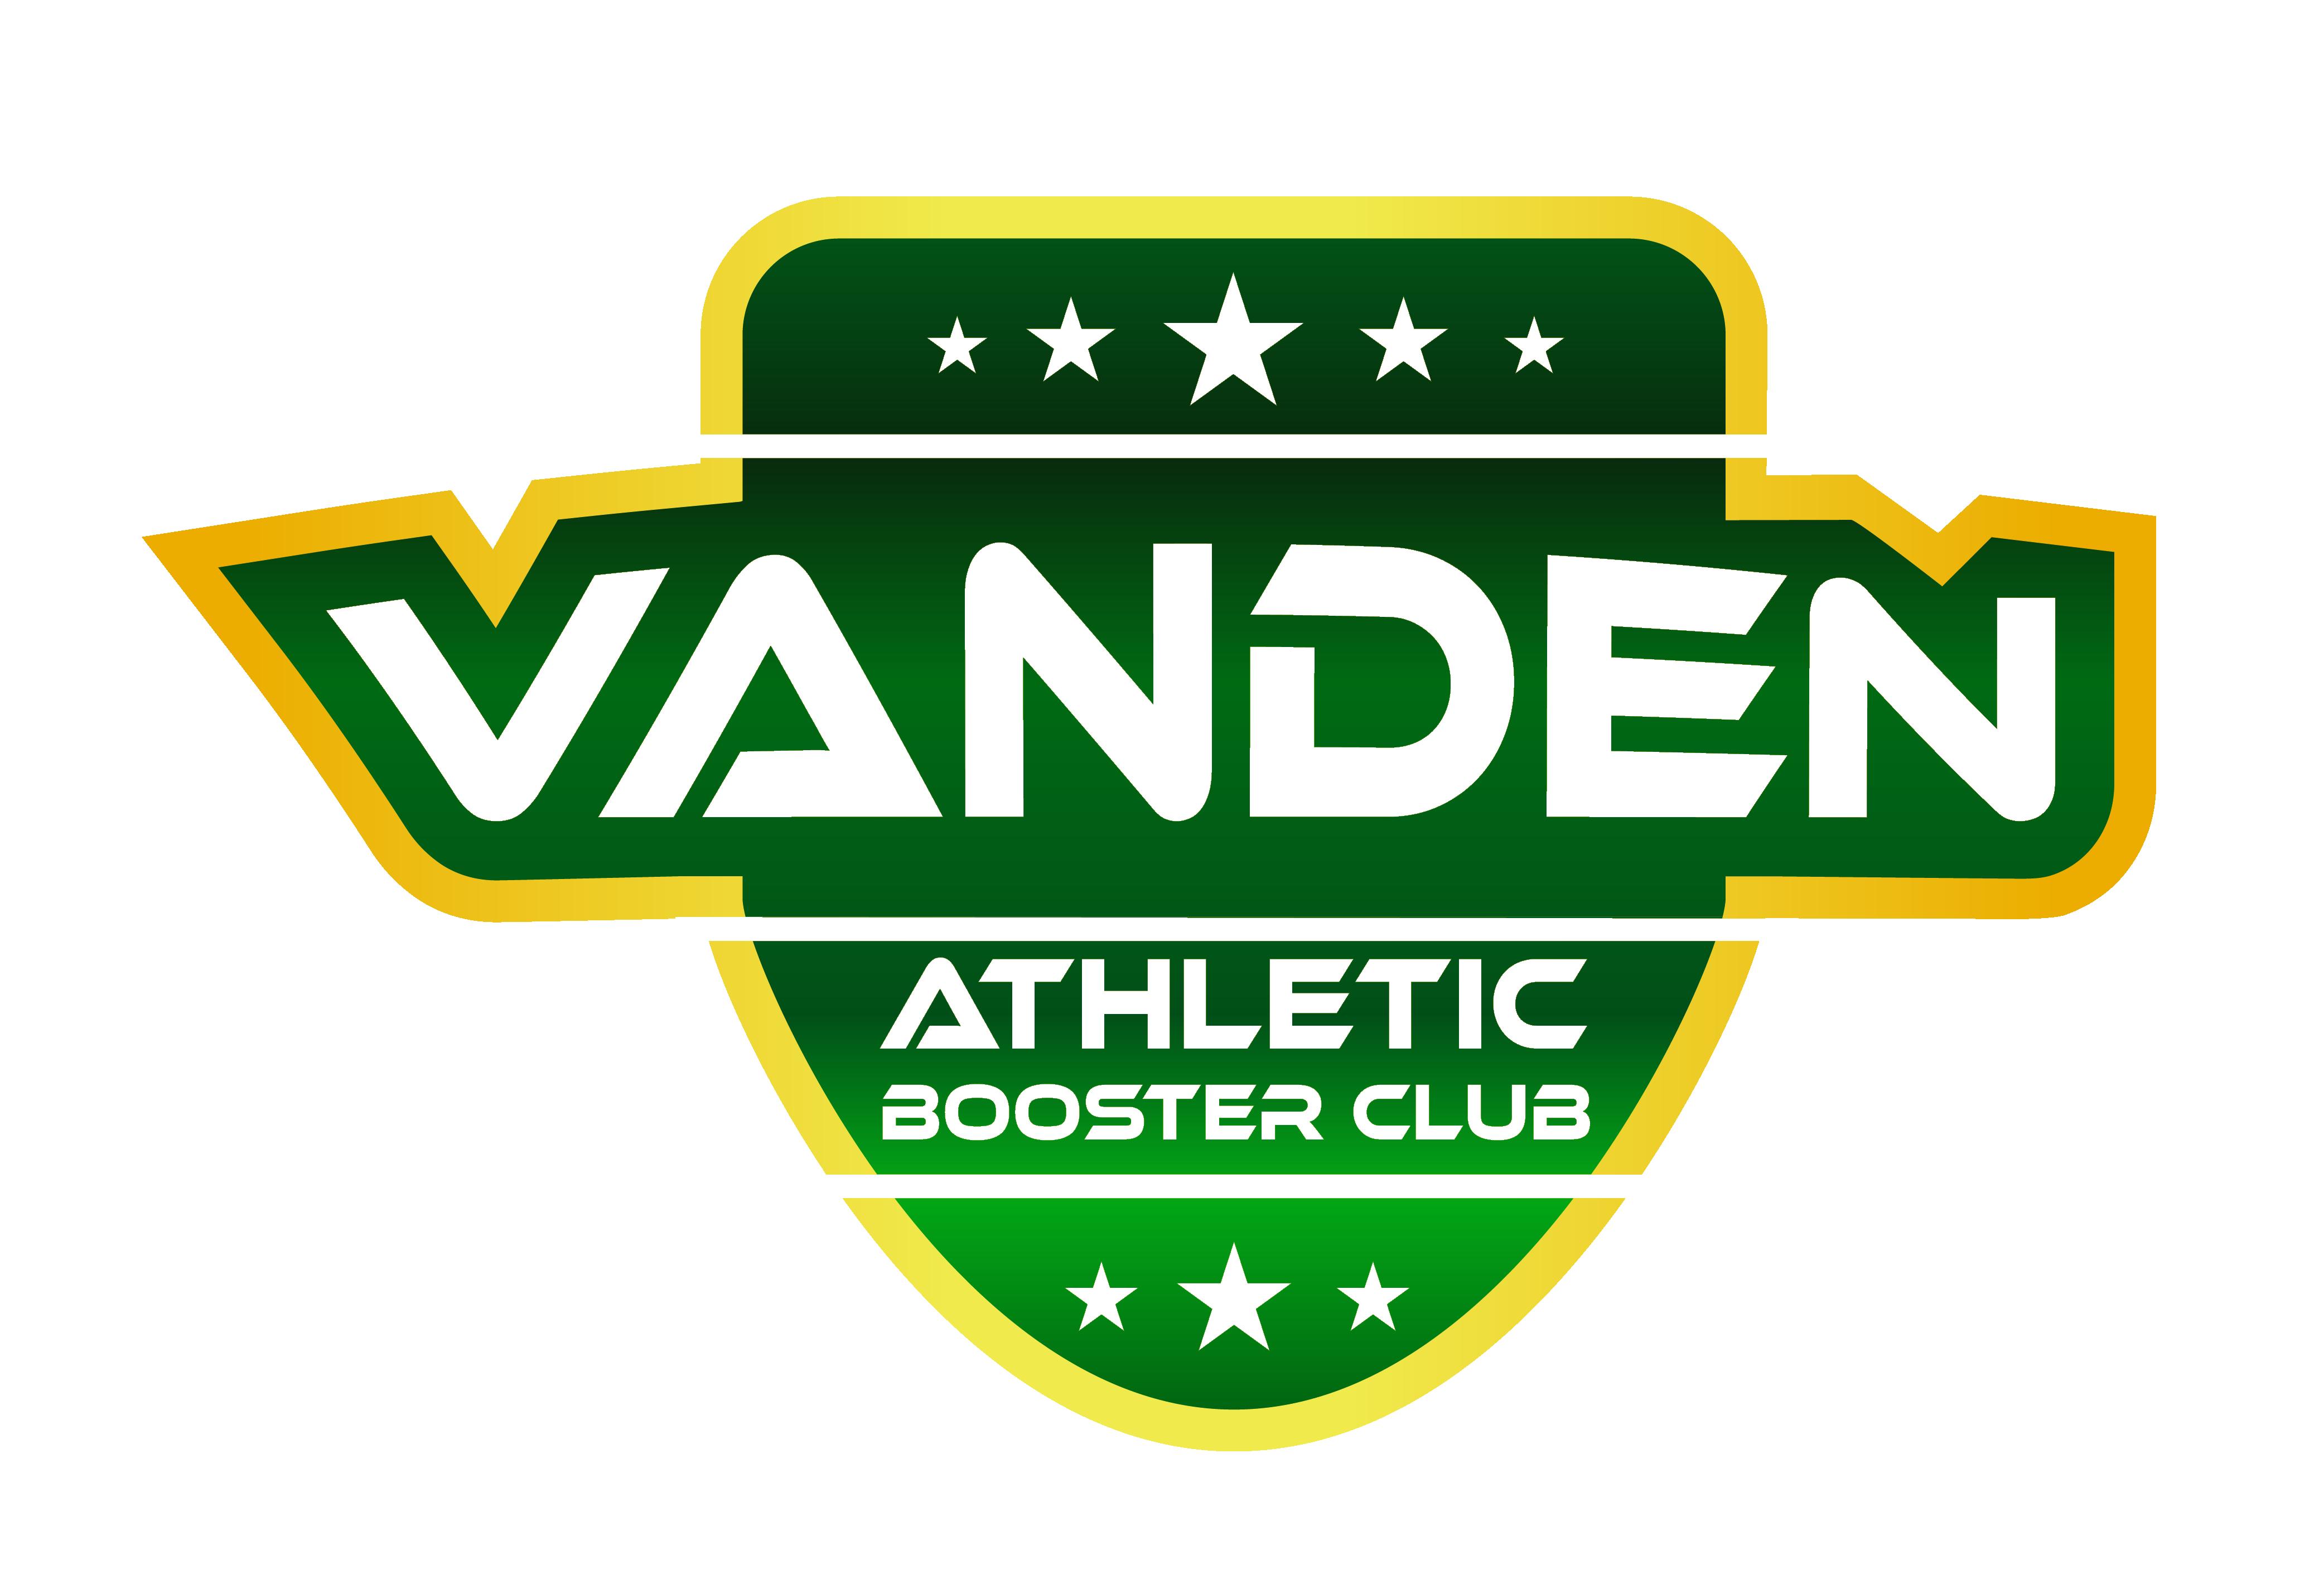 Vanden Athletic Boosters Club, Inc.